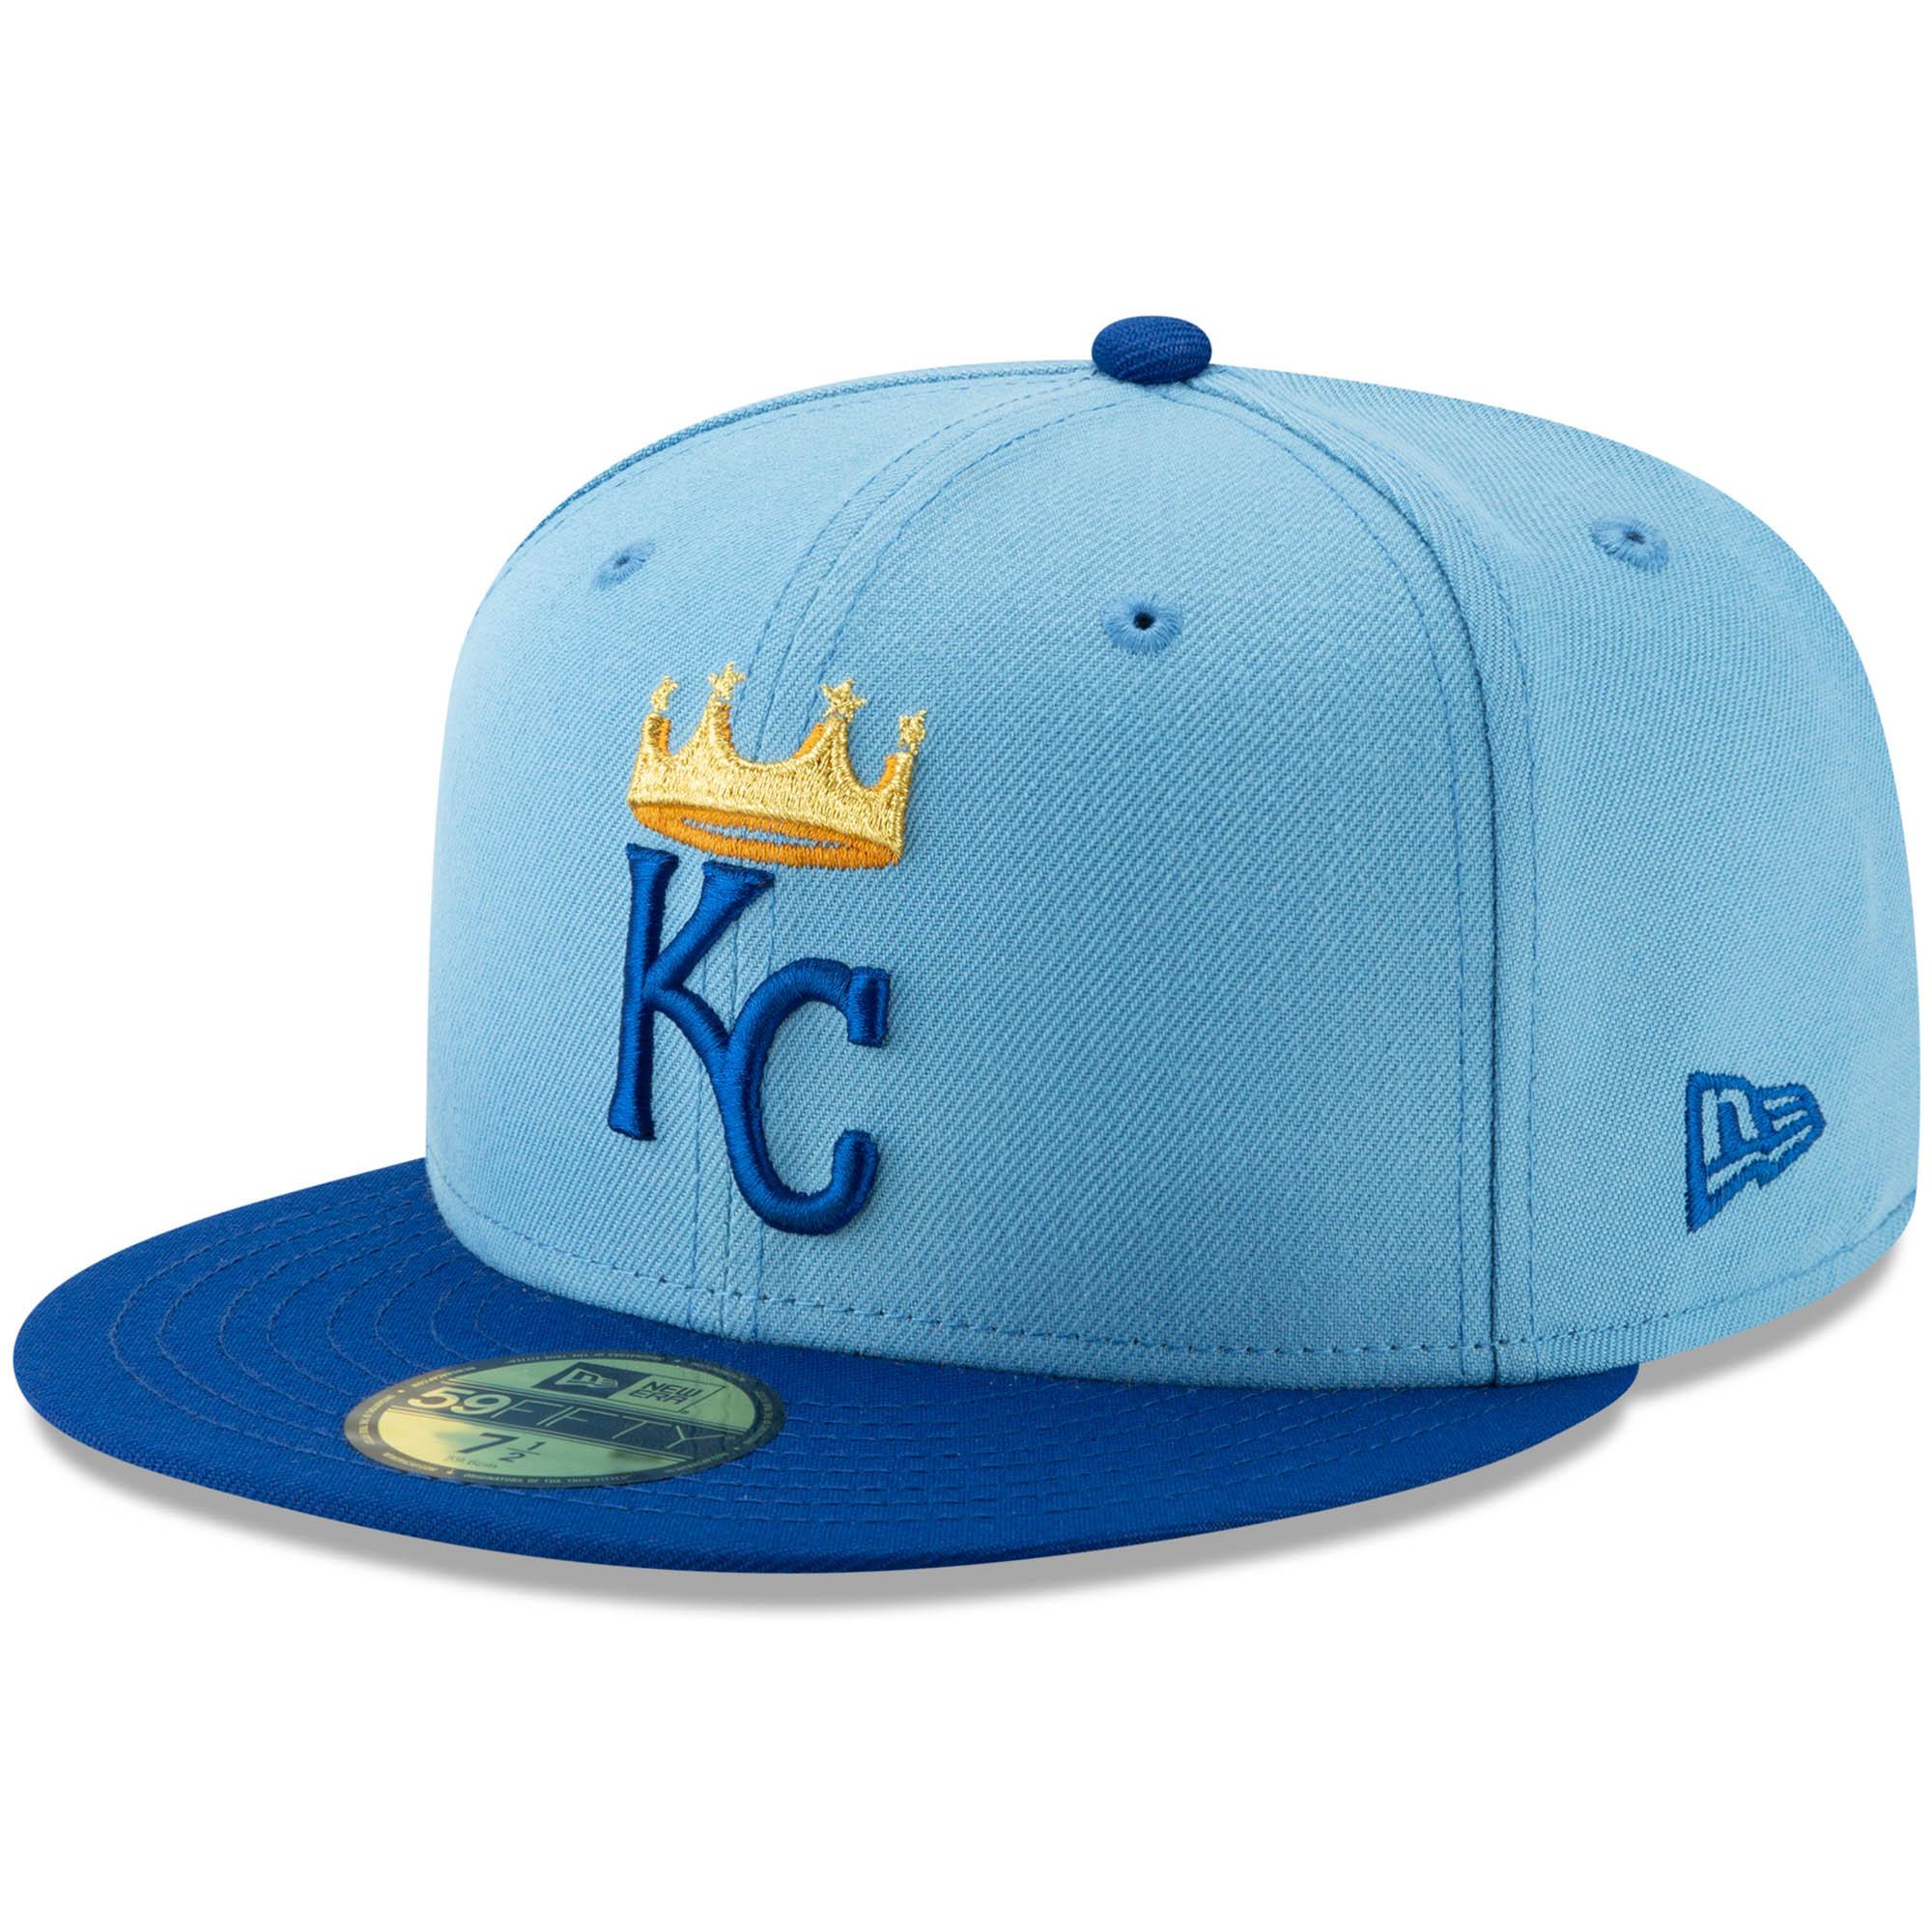 Kansas City Royals New Era Alternate Logo 59FIFTY Fitted Hat - Light Blue